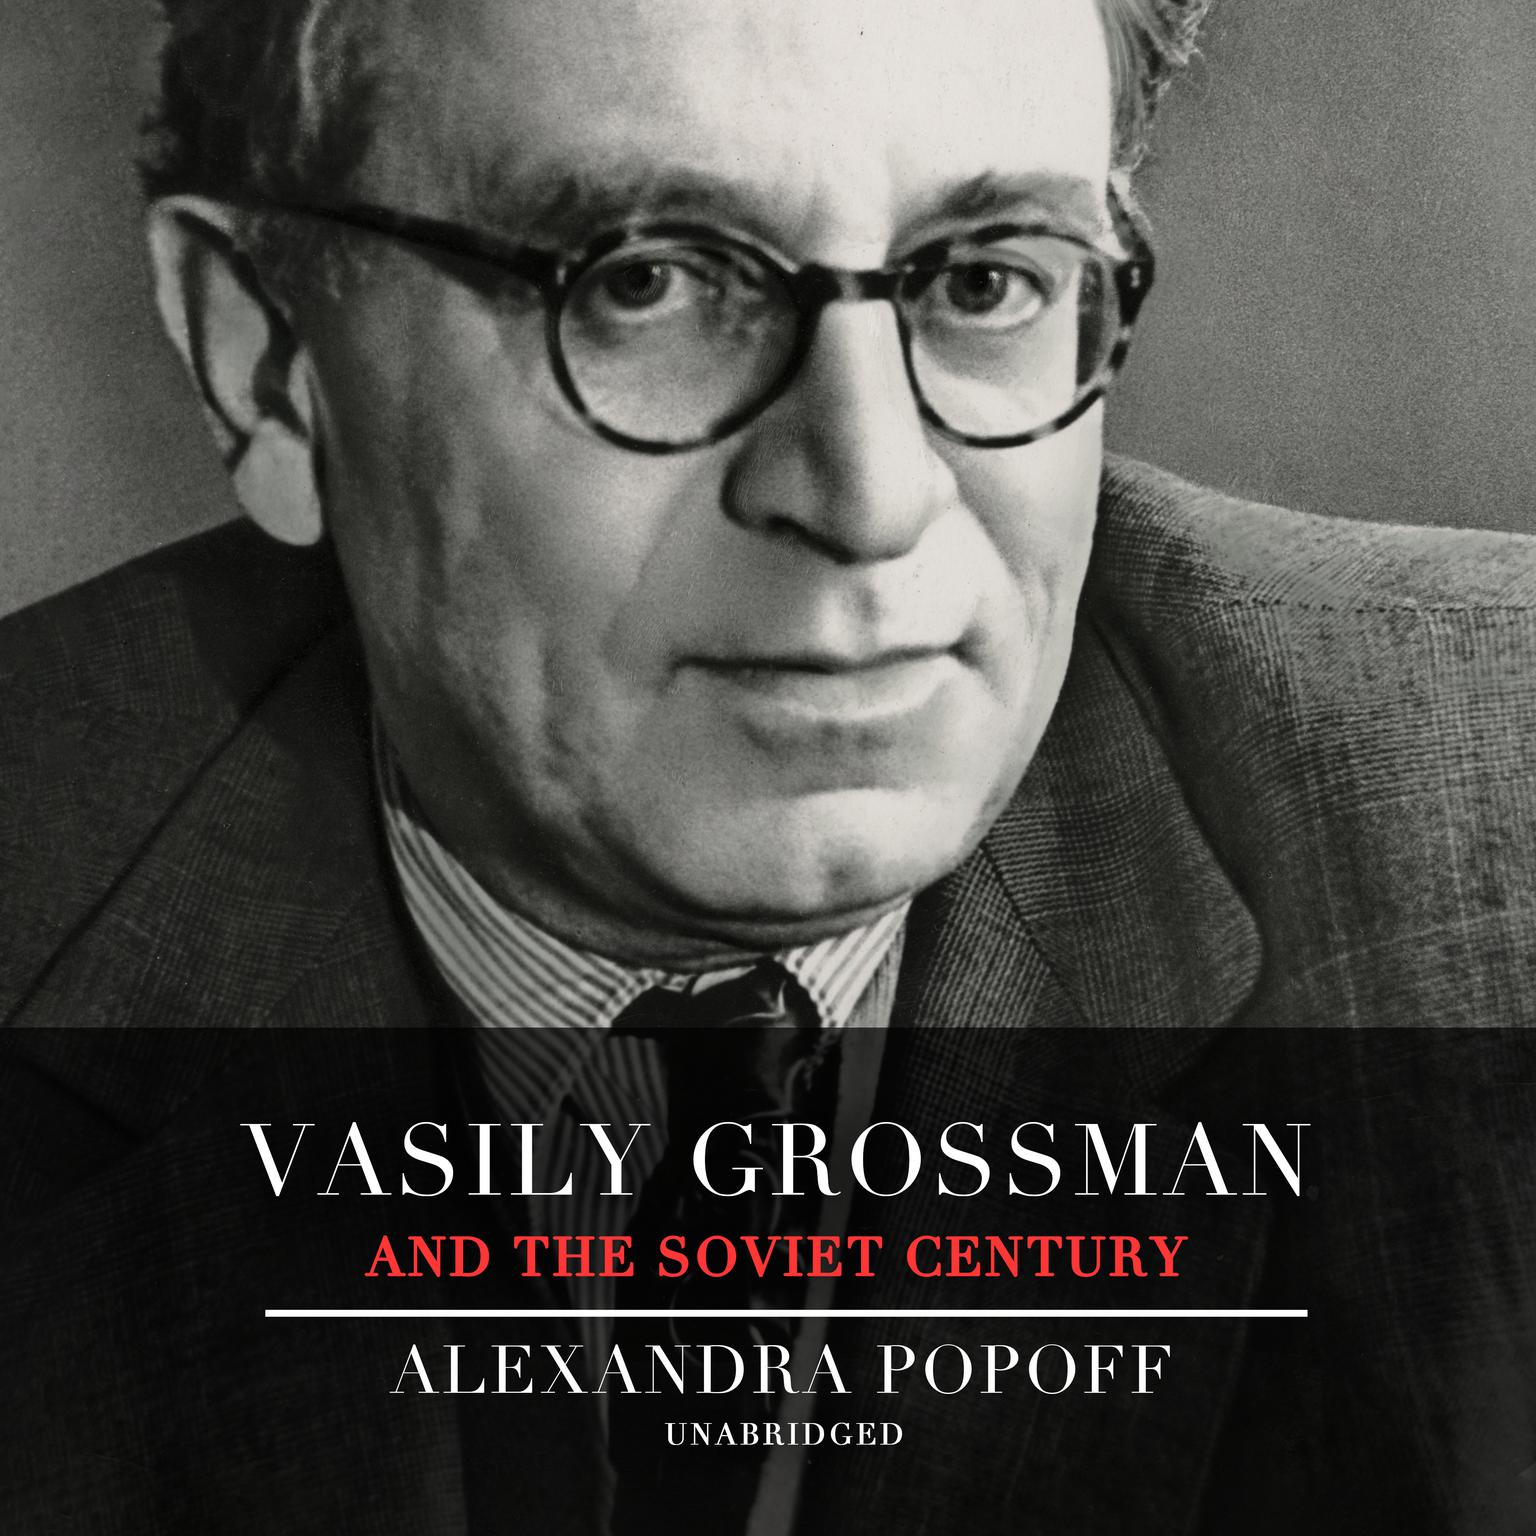 Printable Vasily Grossman and the Soviet Century: Vasily Grossman's Life, Art, and Times Audiobook Cover Art